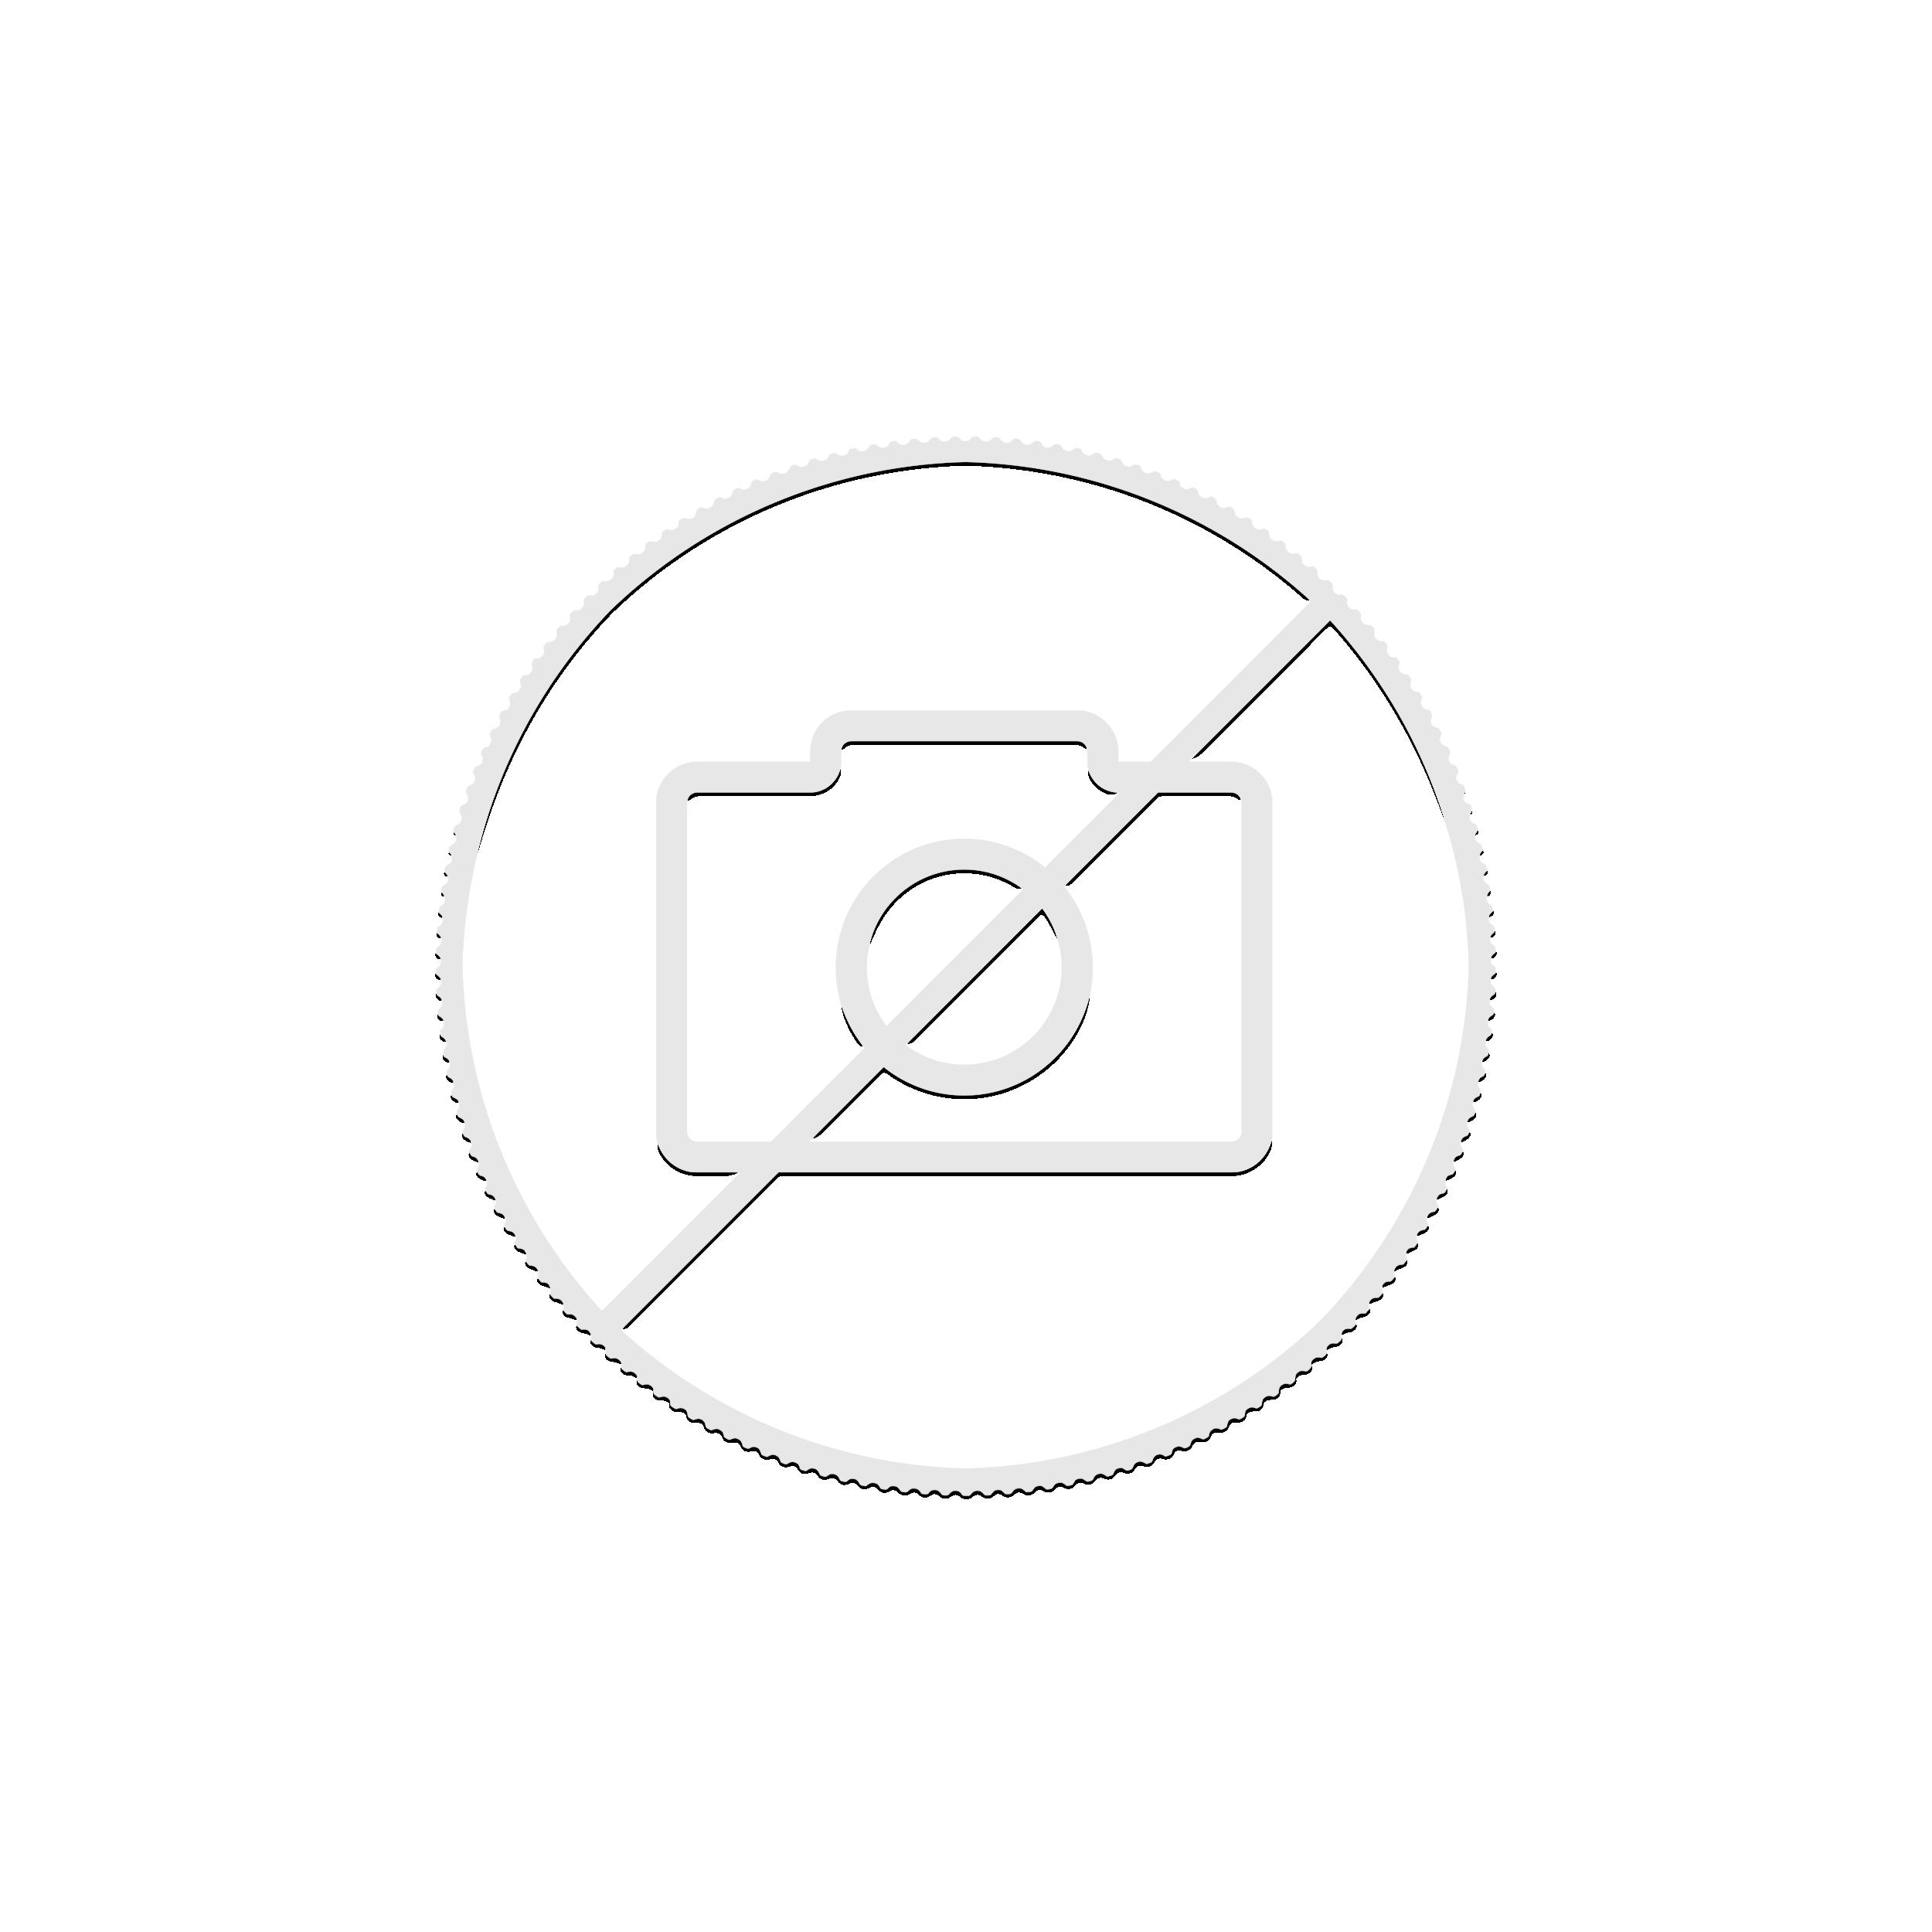 1 Troy ounce gouden munt Lunar 2022 Proof